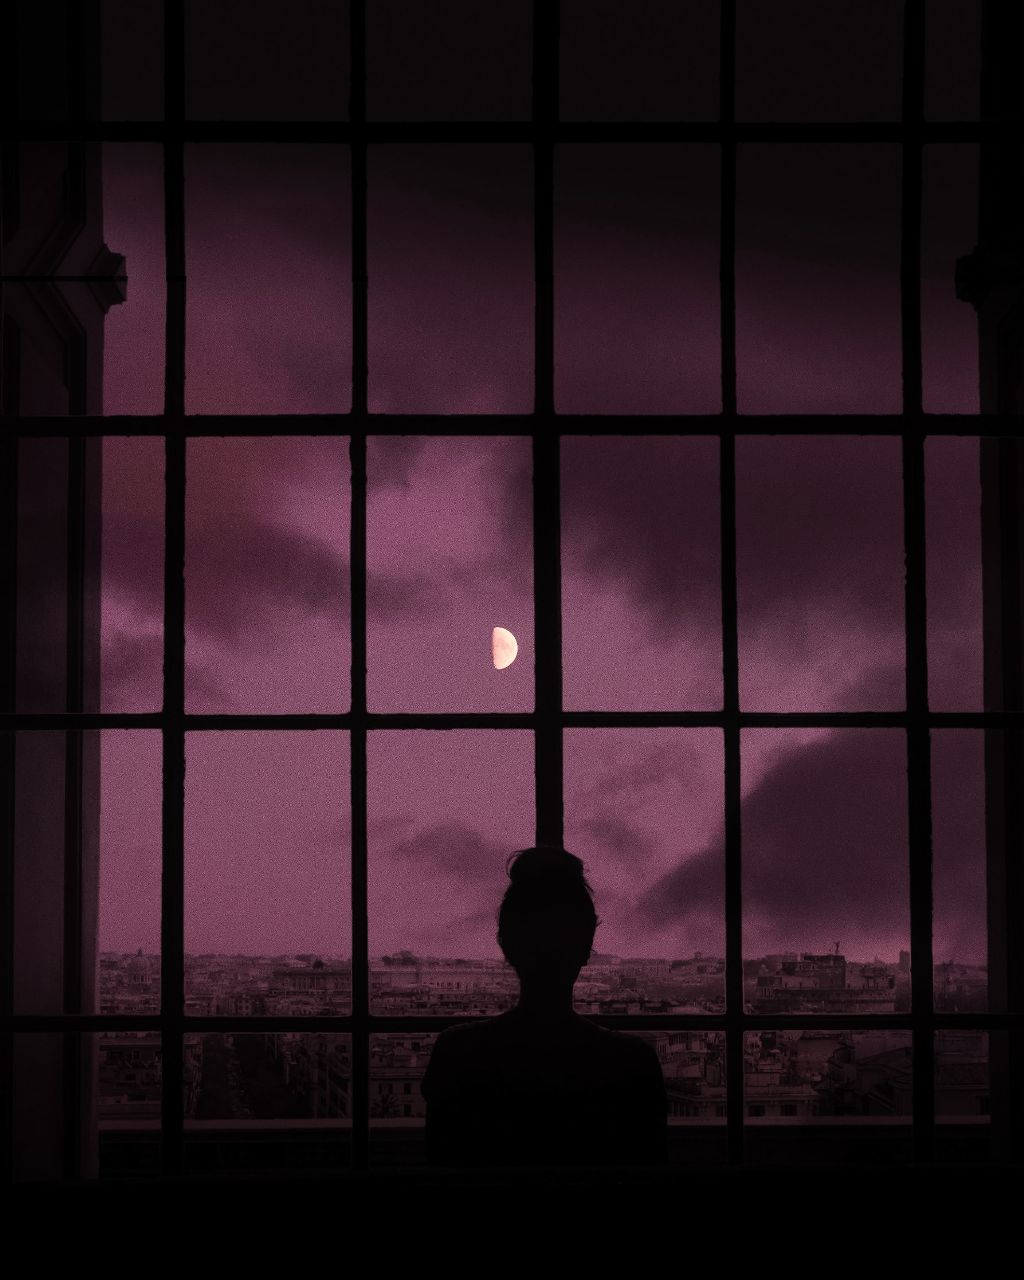 #freetoedit #moon #girl #selenophile #night #dark #window @picsart